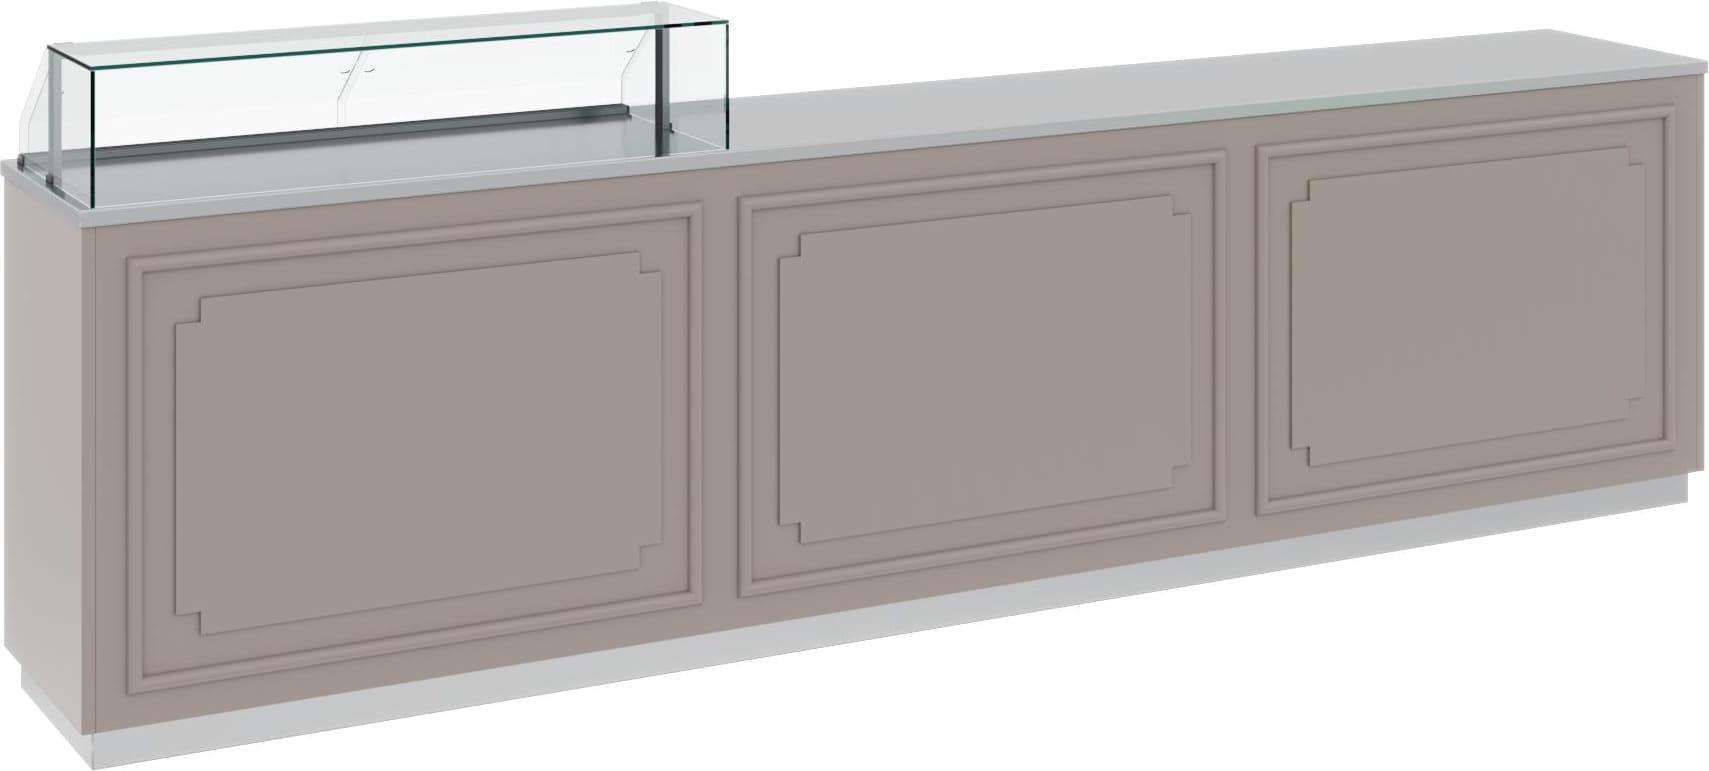 Нейтральная витрина CARBOMA AC40N 1.25-1 - 1